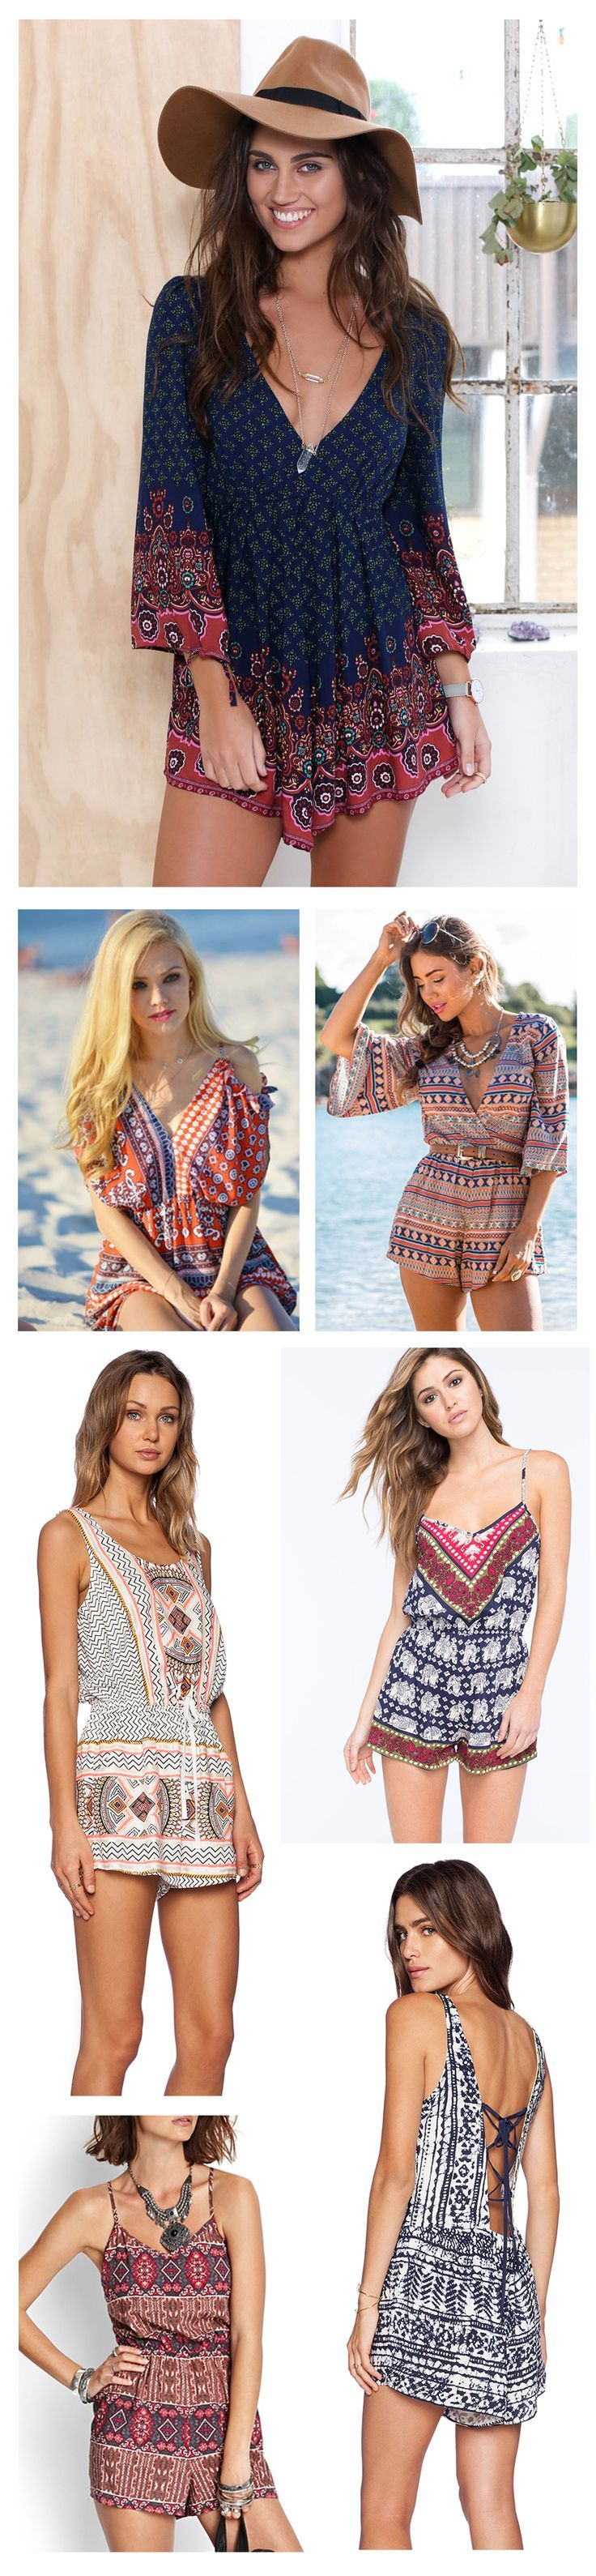 Stylish Print Jumpsuit/Romper Outfits